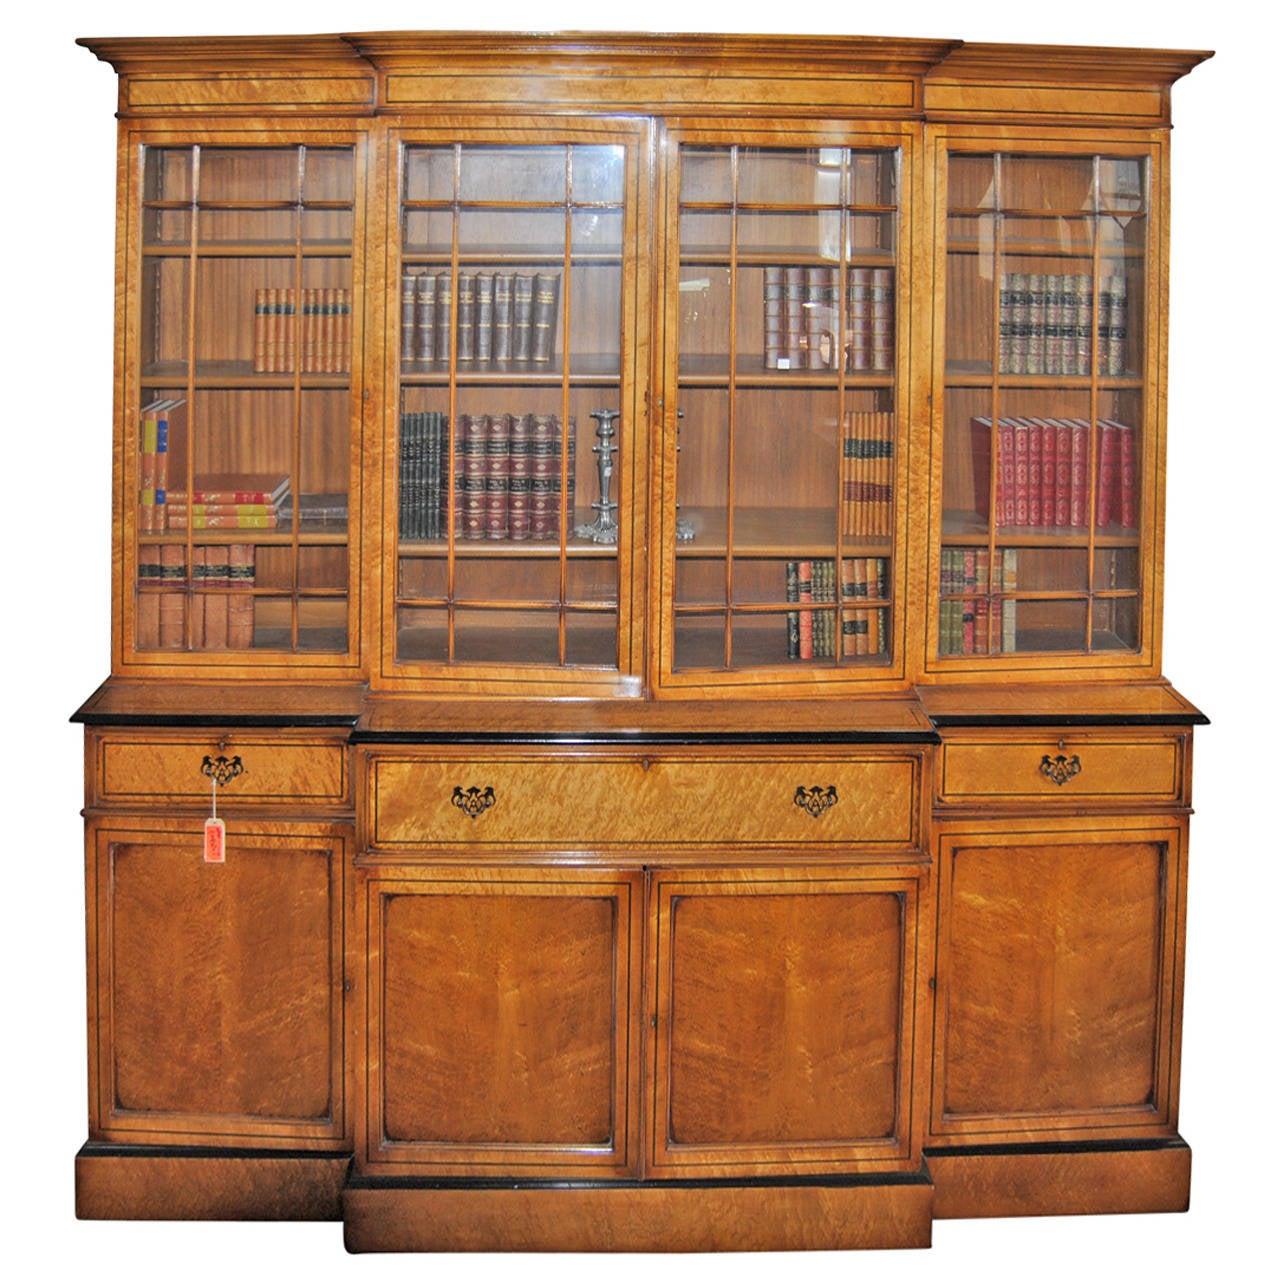 Crib for sale sheffield - English Bird S Eye Maple Breakfront Or Bookcase